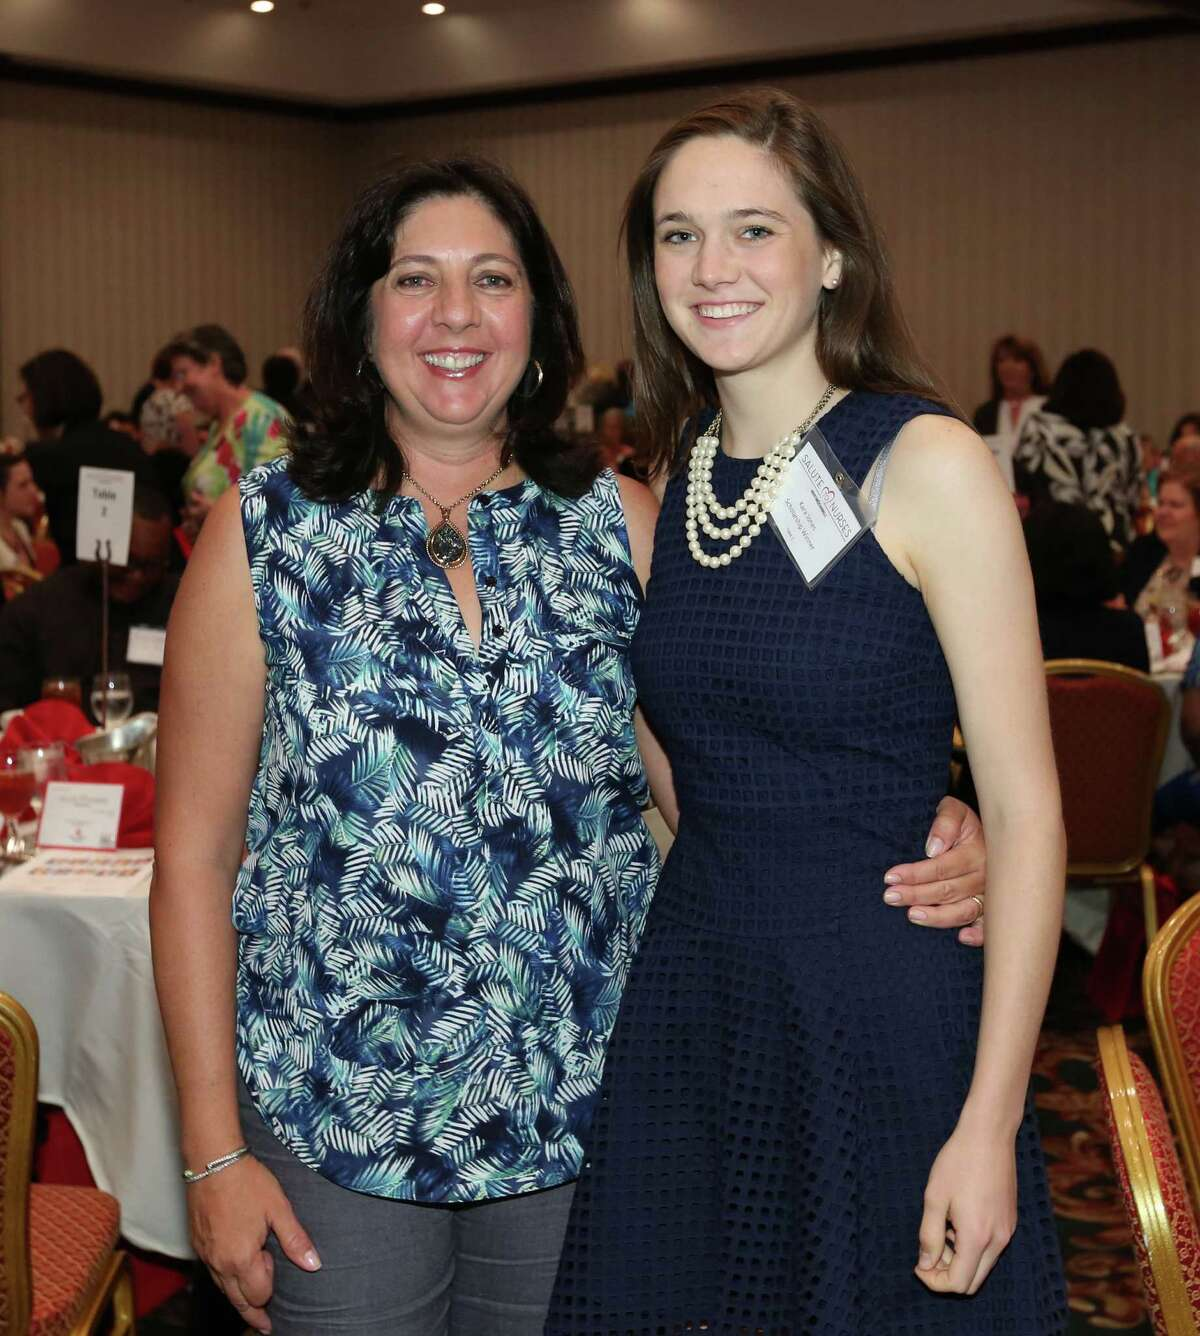 Kara and Monica Jones at the Houston Chronicle Salute to Nurses Luncheon.